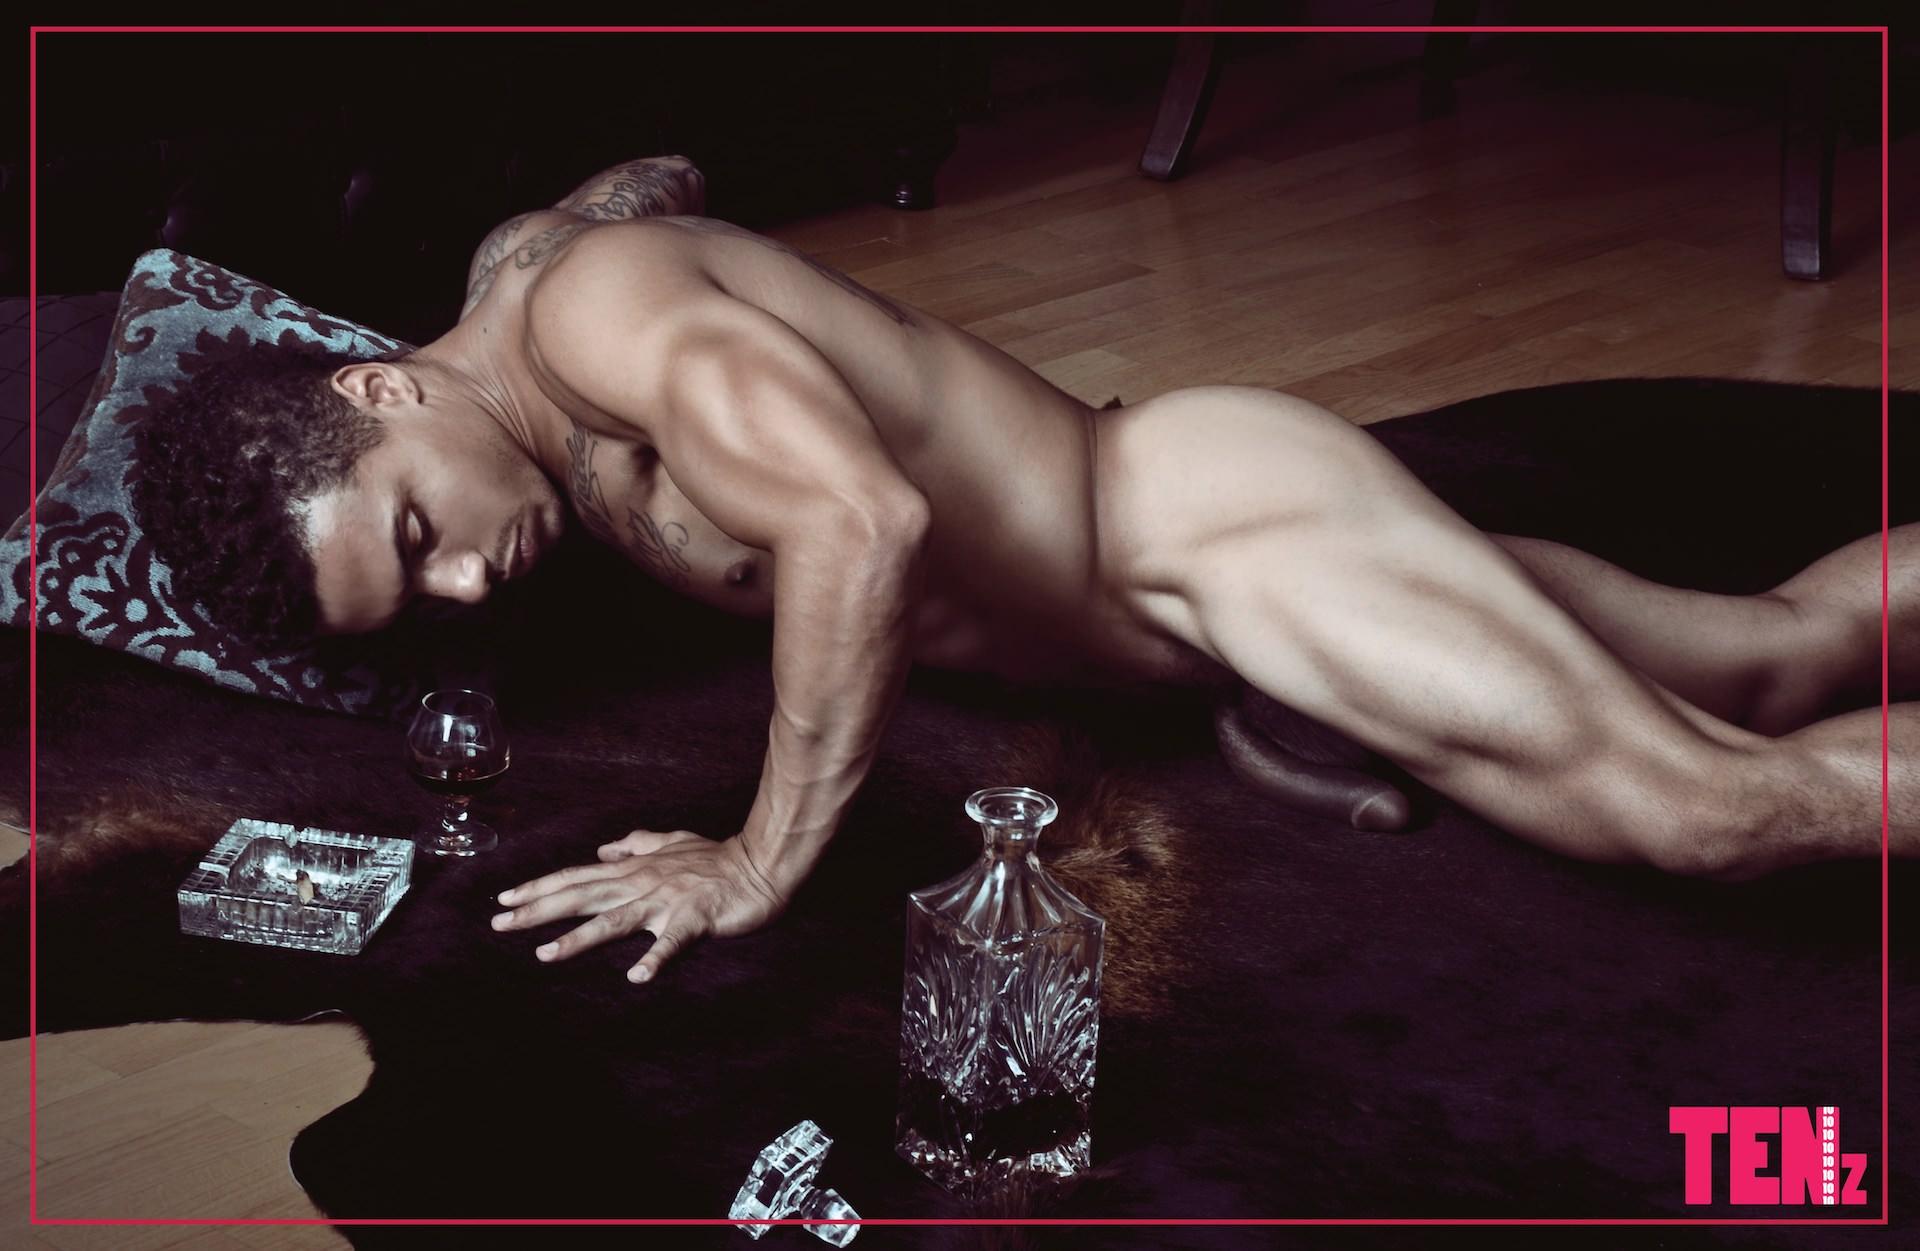 Brando novak naked — photo 3